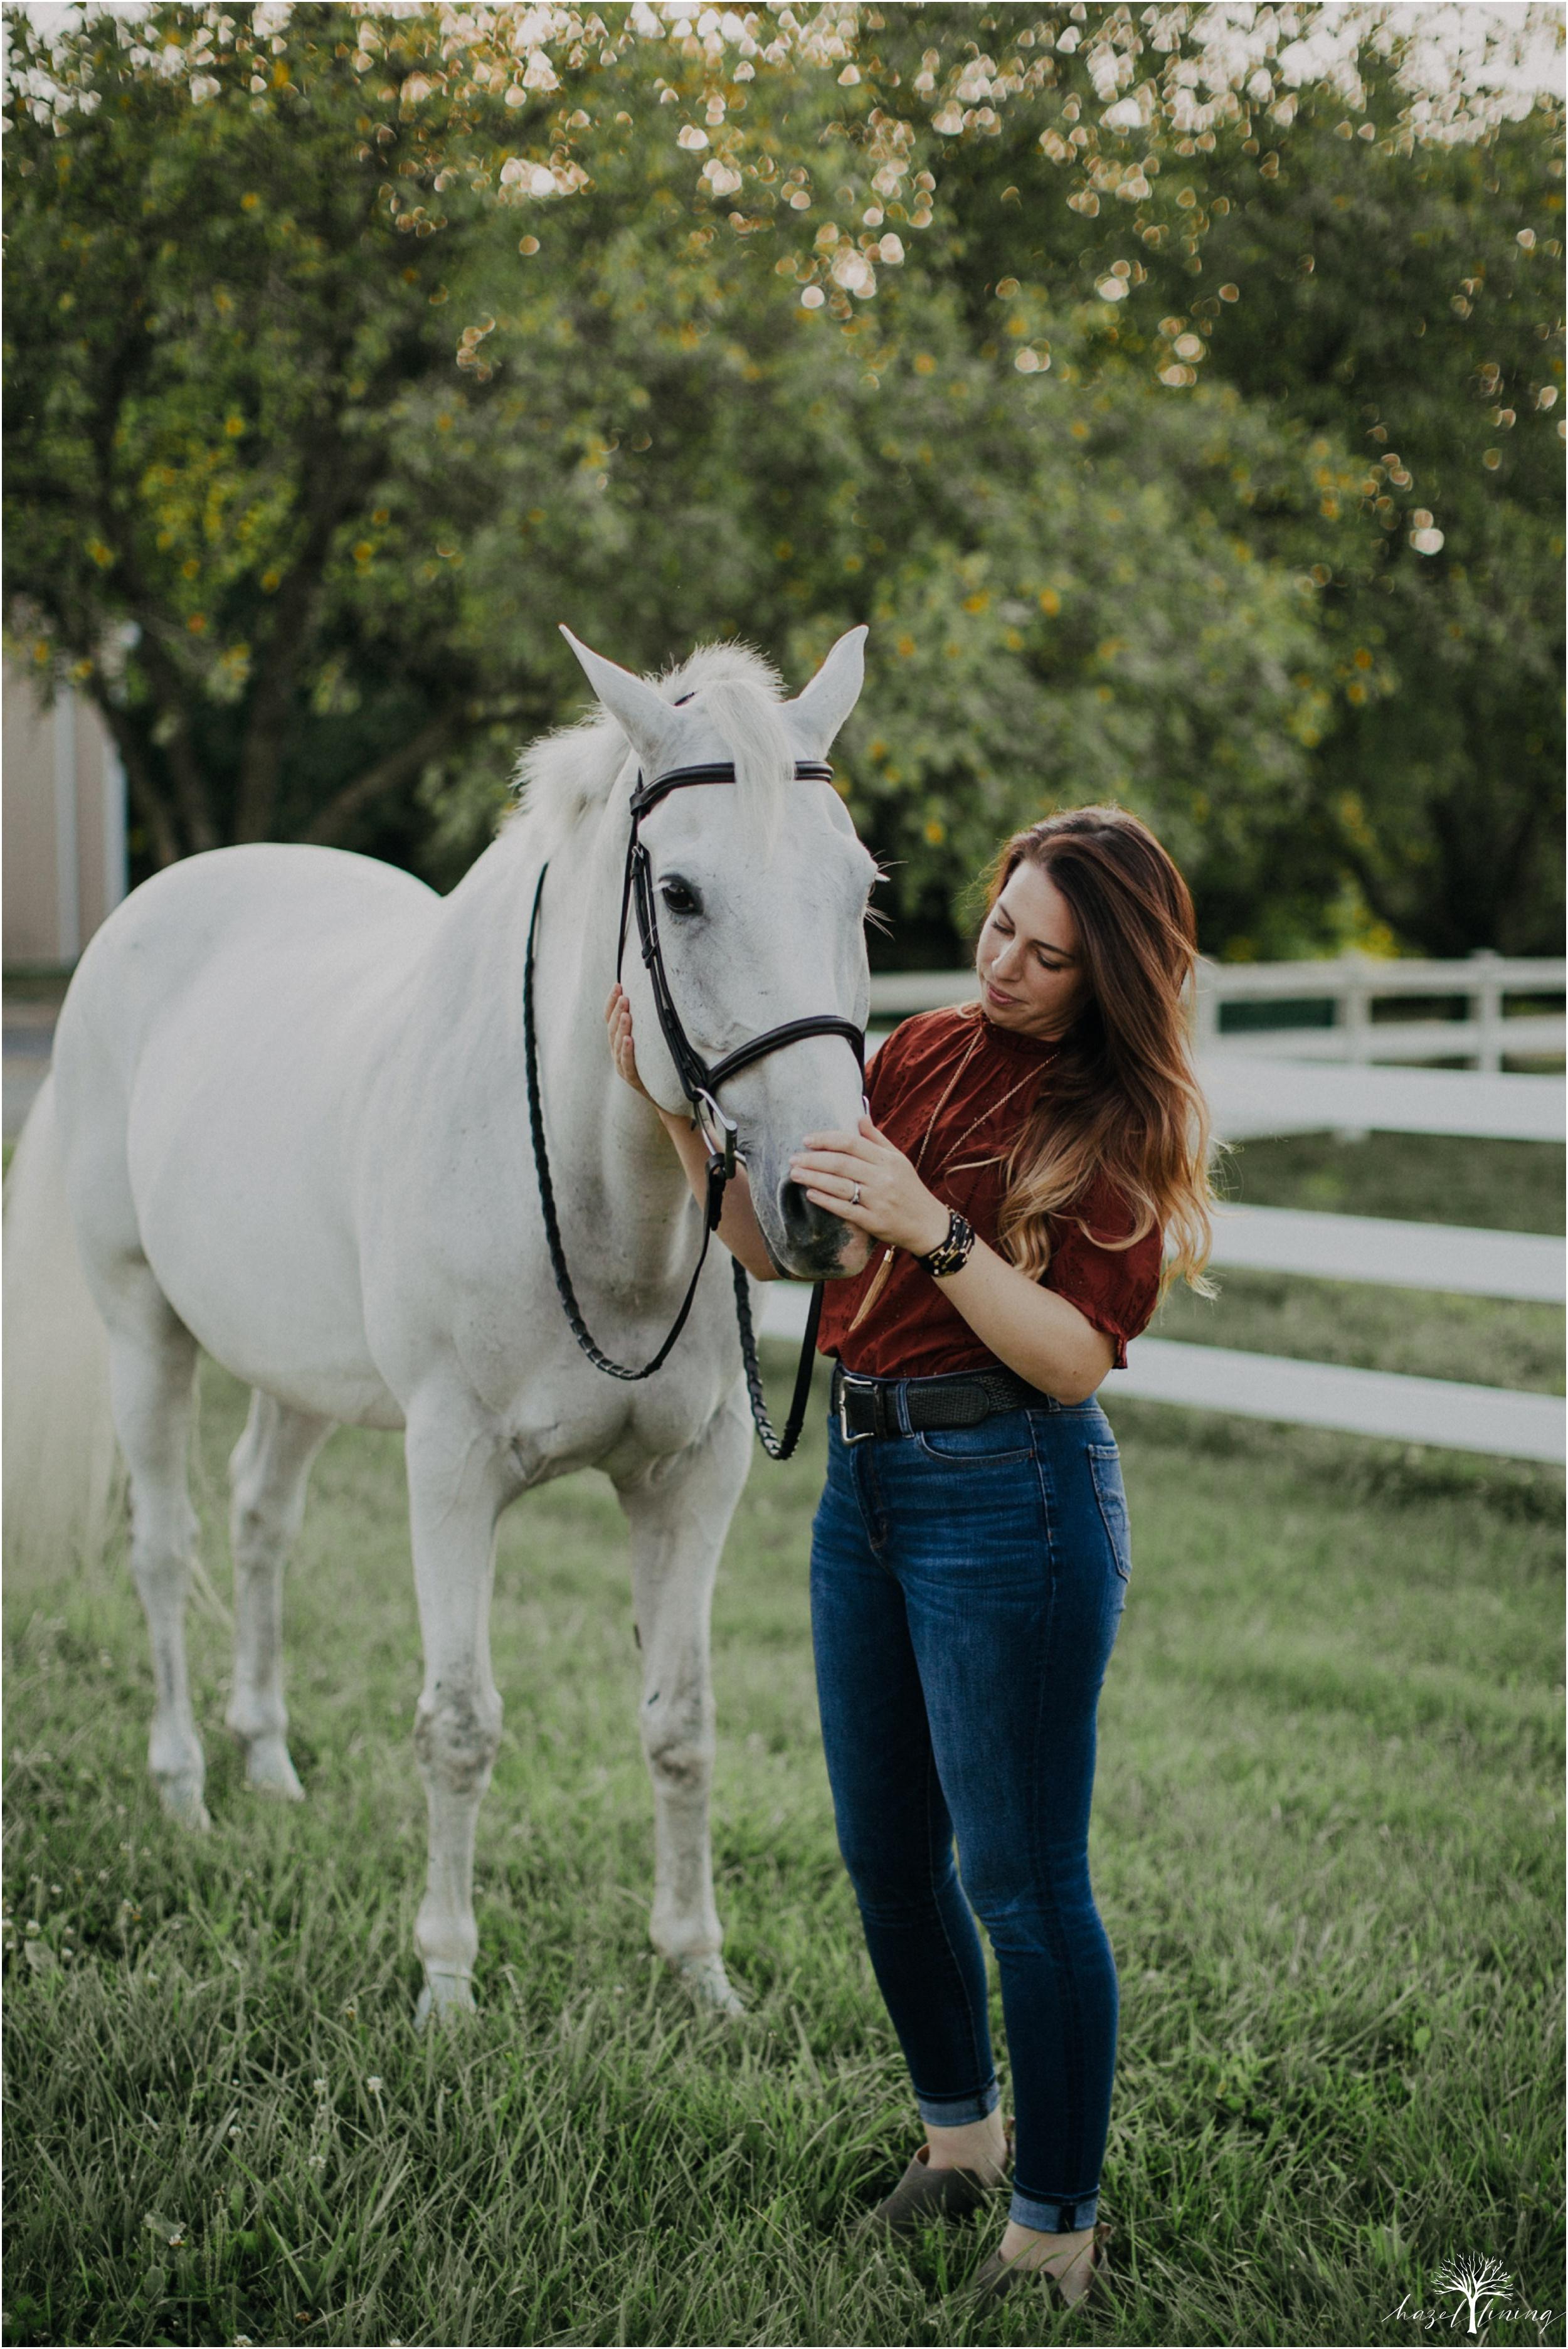 taylor-adams-and-horse-delaware-valley-university-delval-summer-equestrian-portrait-session-hazel-lining-photography-destination-elopement-wedding-engagement-photography_0003.jpg